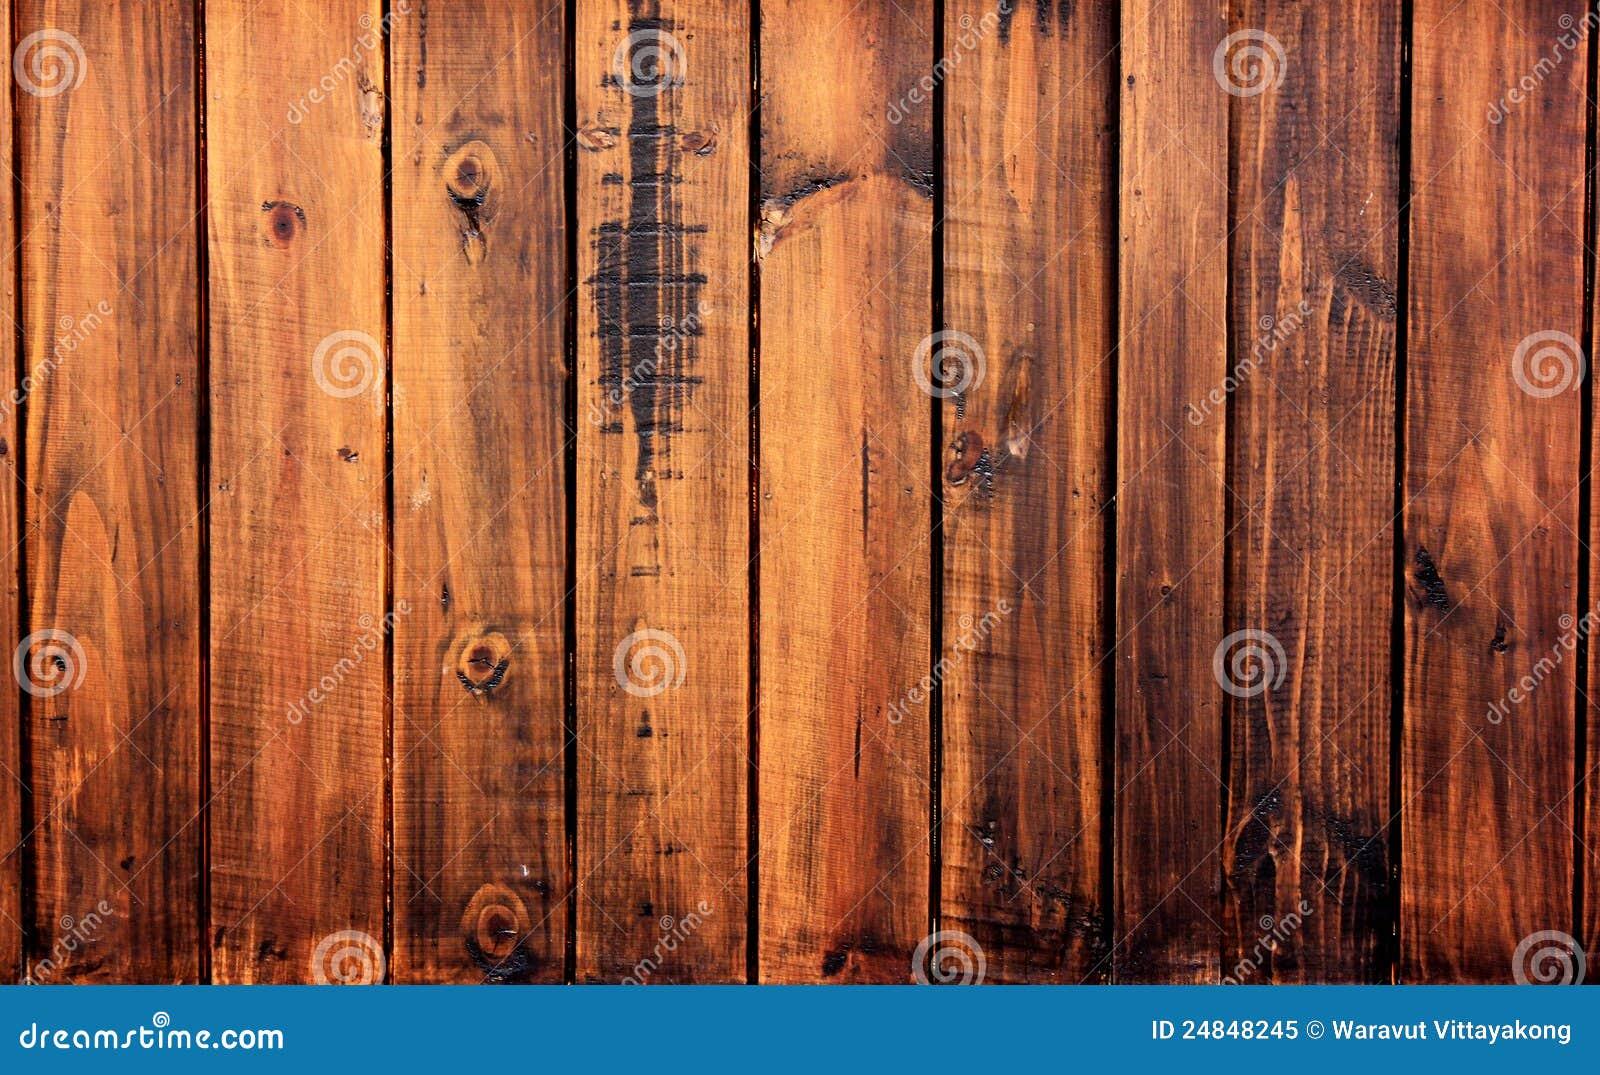 Paredes de madera foto de archivo libre de regal as - Pared de madera ...